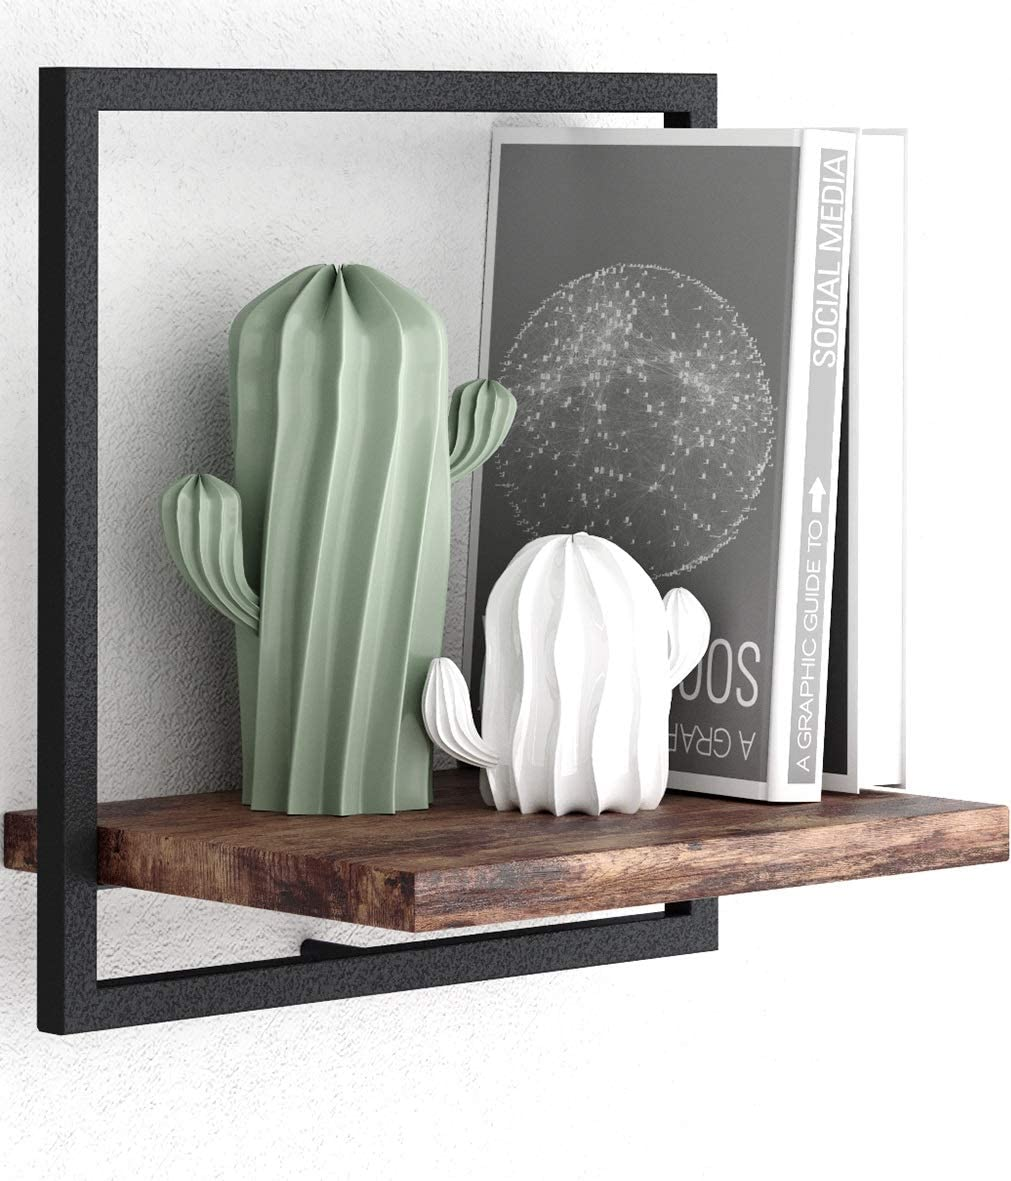 LEVITATE Seasonal Wrap Introduction Floating Shelves Ranking TOP20 - Easy Wall Shelf Hanging B Square